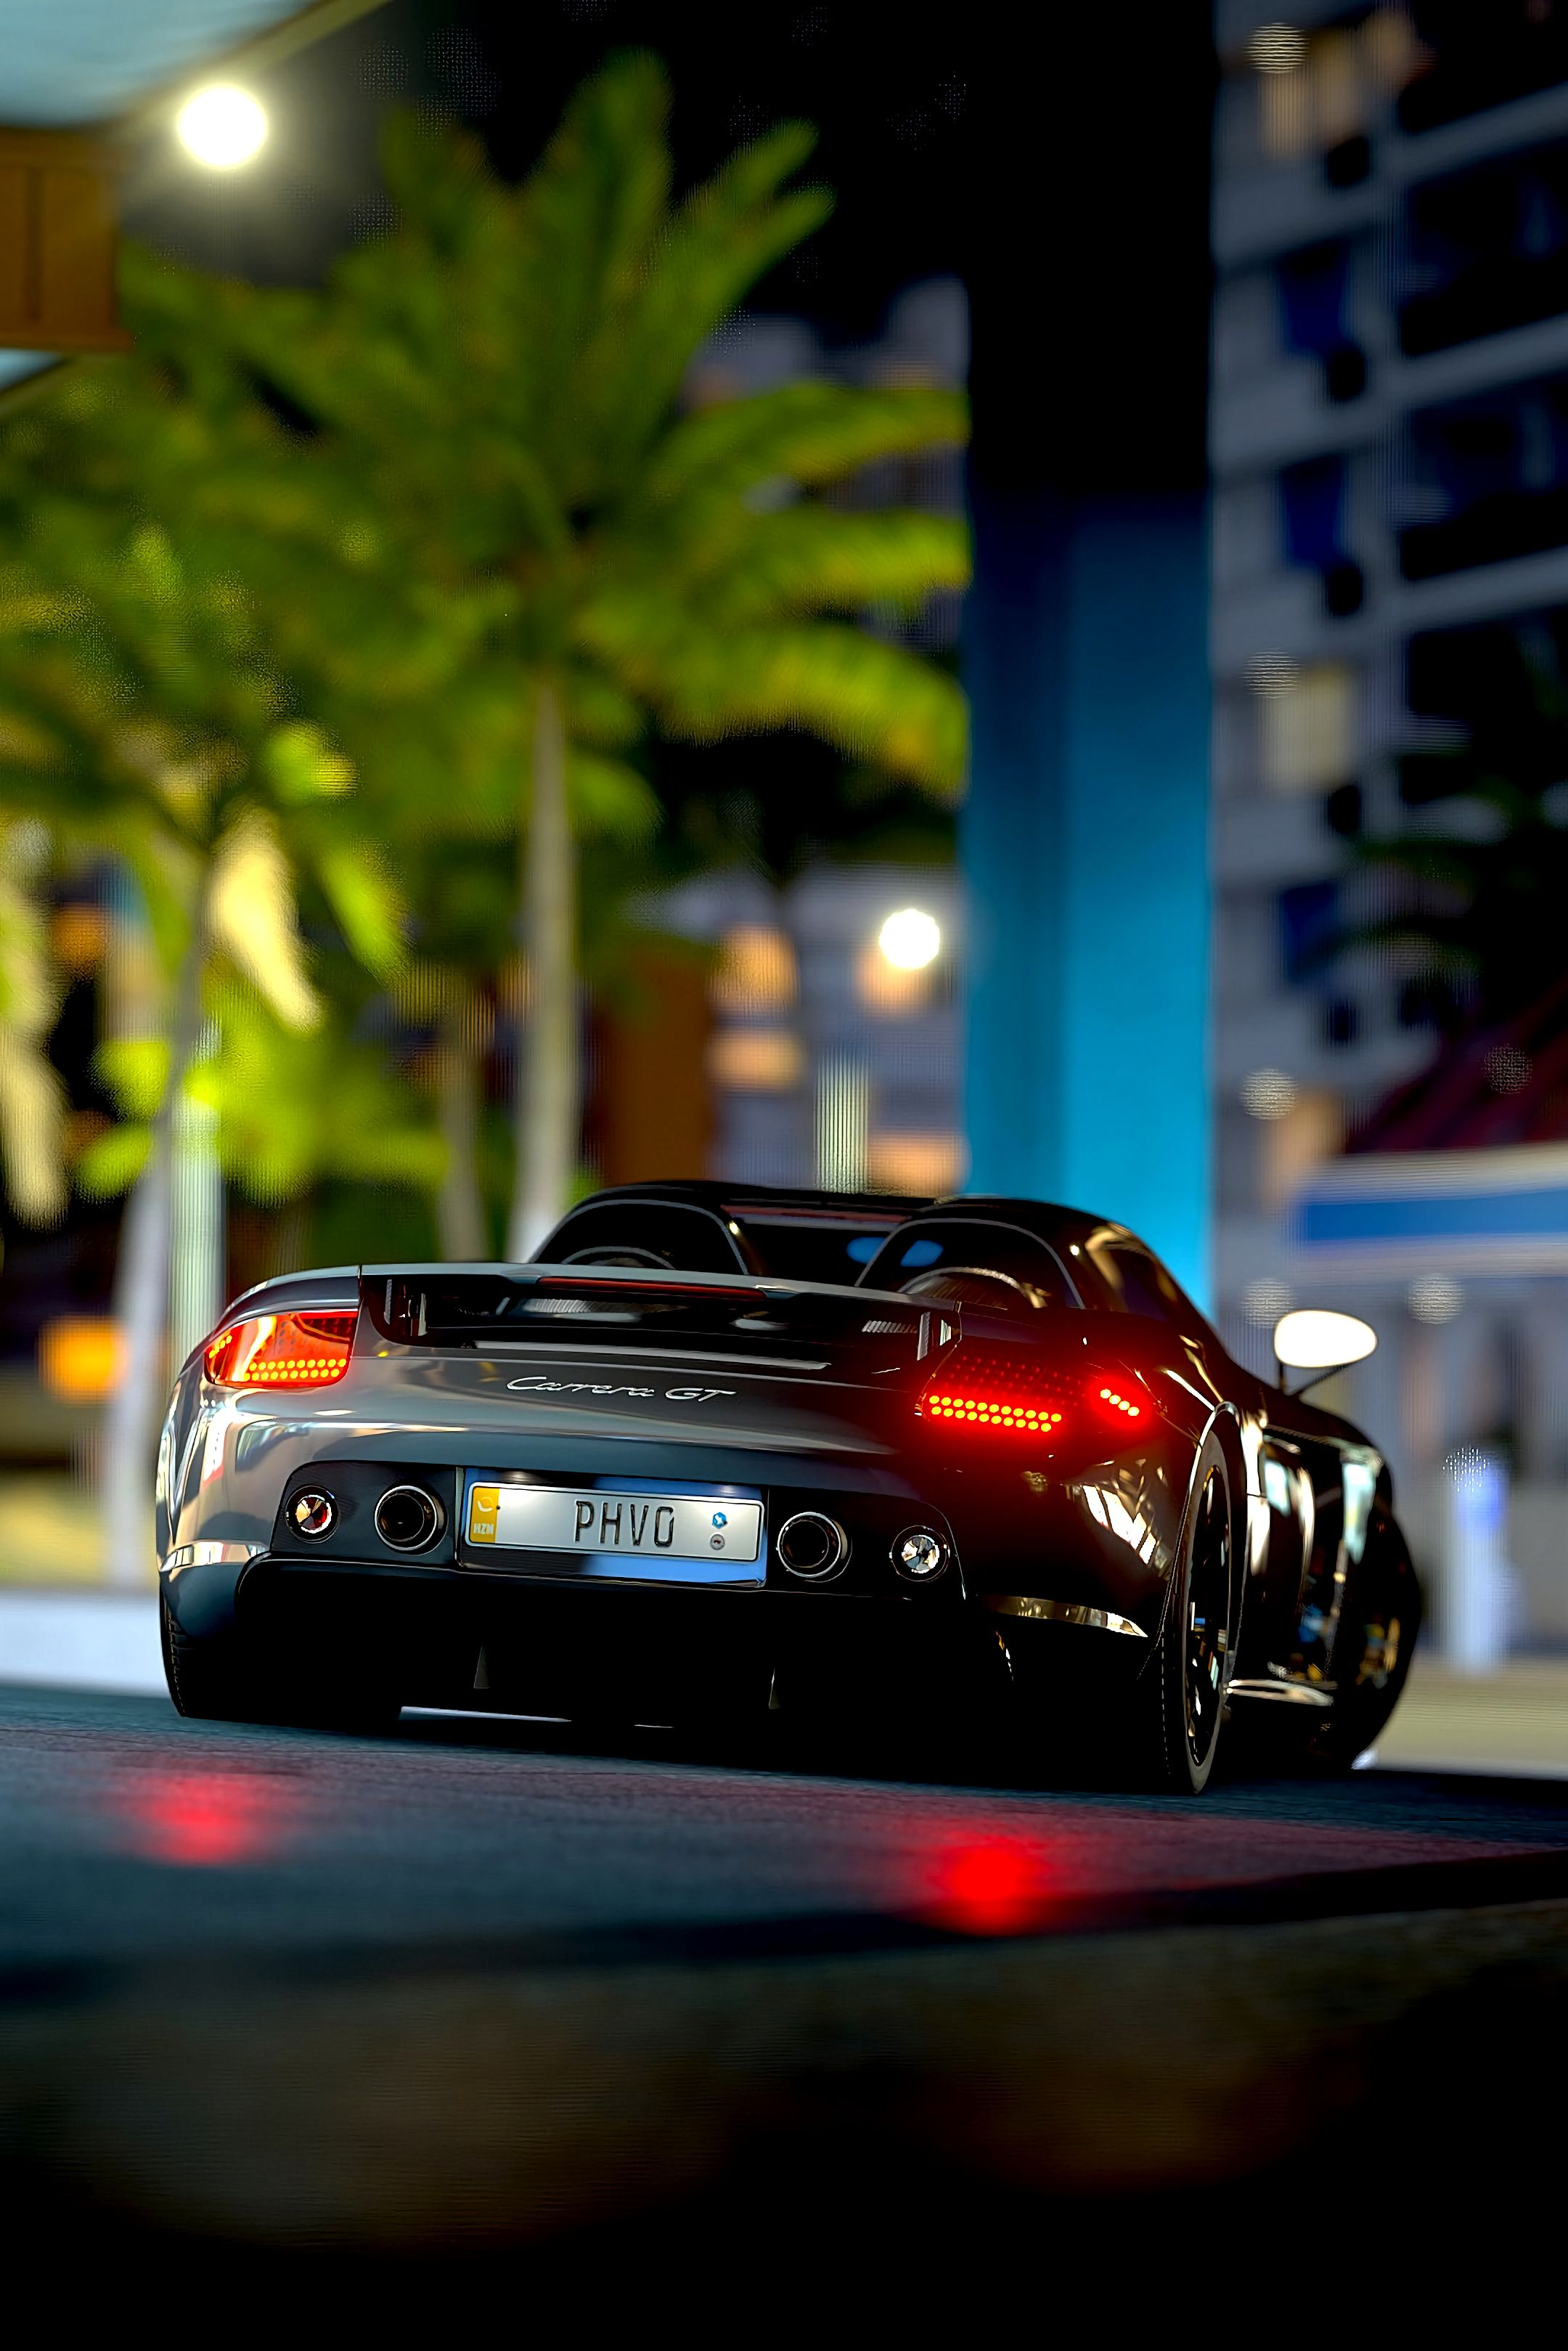 Download mobile wallpaper Light, Sports, Porsche, Cars, Shine, Sports Car, Supercar, Race, Porsche Carrera Gt, Porsche Carrera for free.